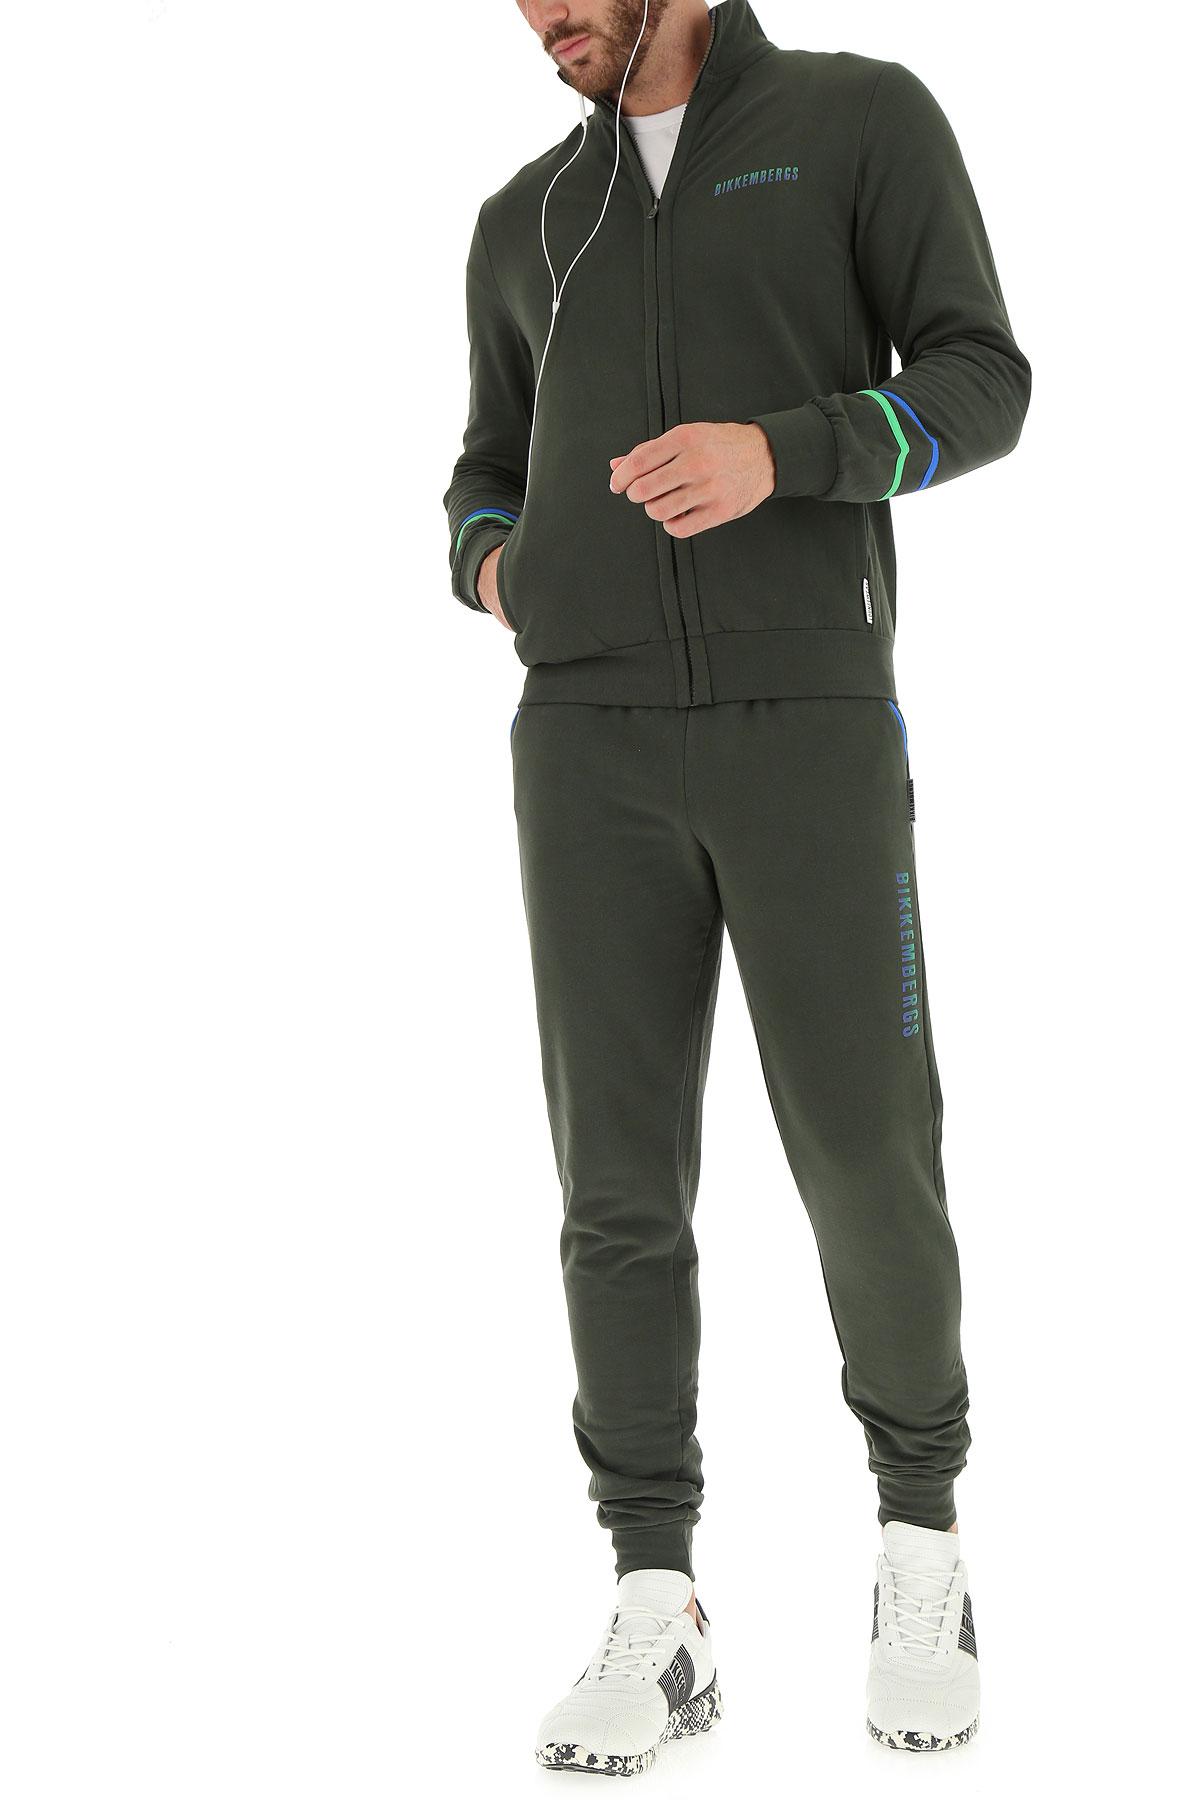 19 Ropa Bluette invierno Hombres Oscuro Militar Bikkembergs Verde Otoño 2018 Para xFZ7qqwT